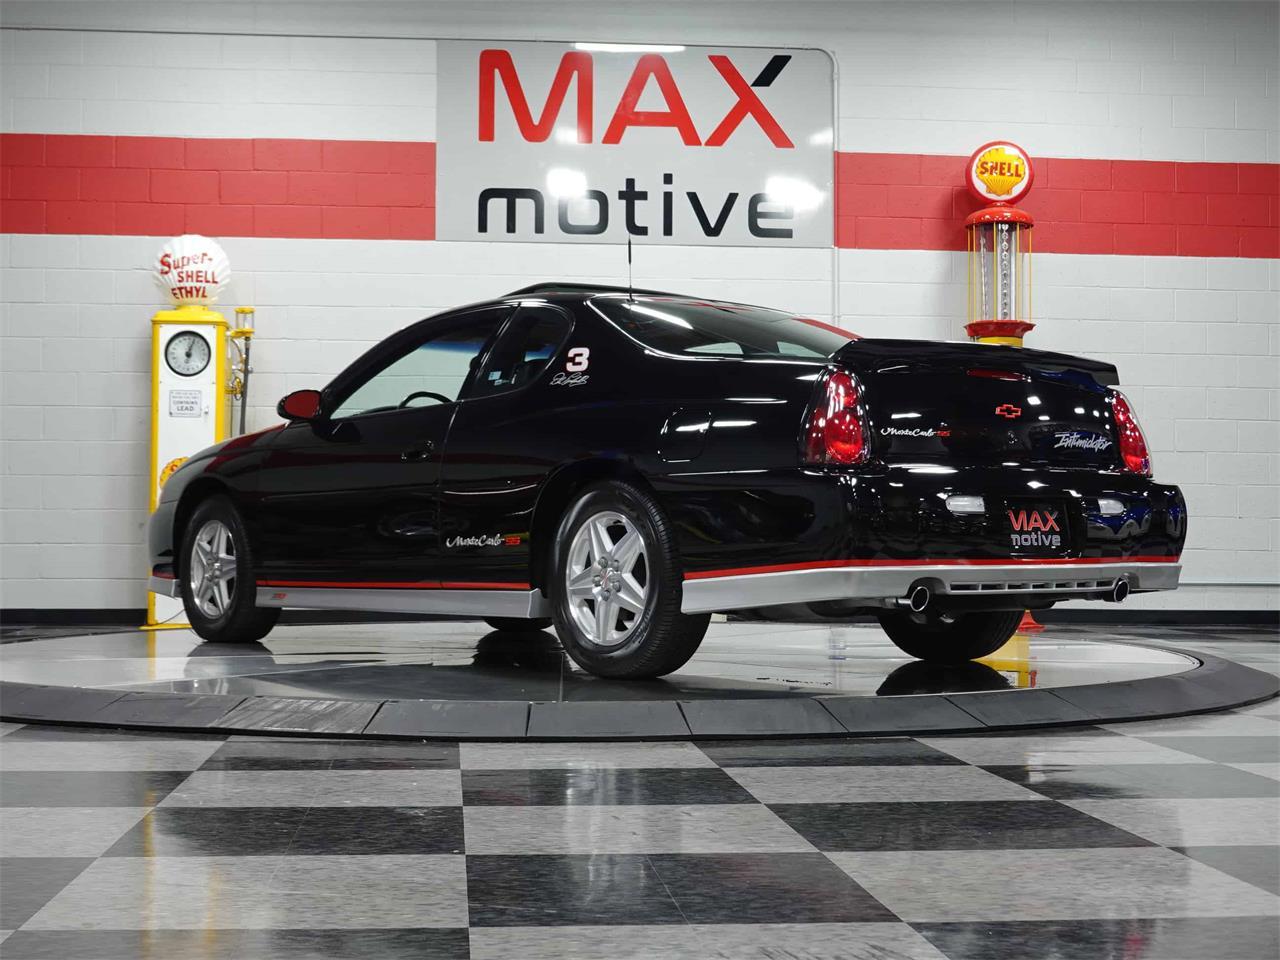 2002 Chevrolet Monte Carlo (CC-1382941) for sale in Pittsburgh, Pennsylvania